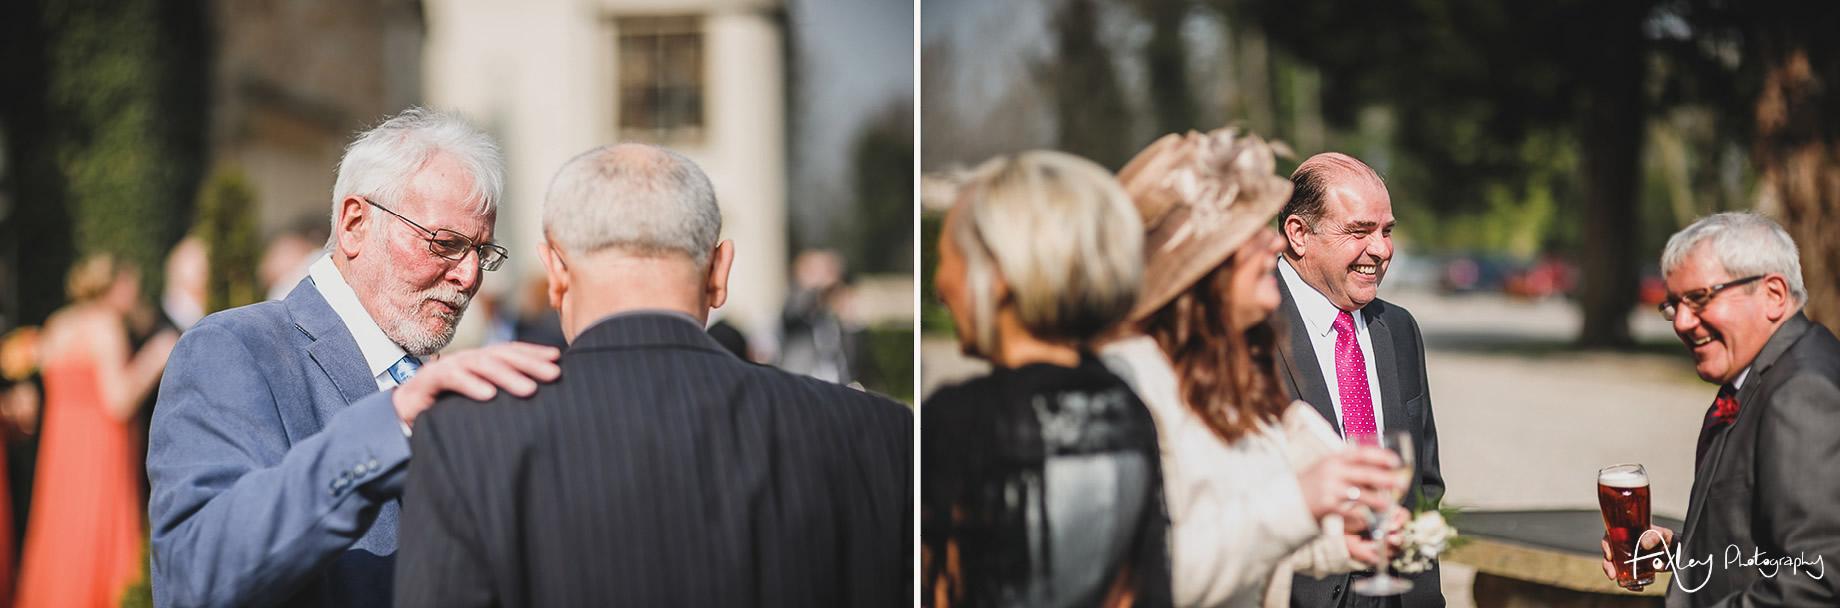 Gemma and Lewis' Wedding at Mitton Hall 097